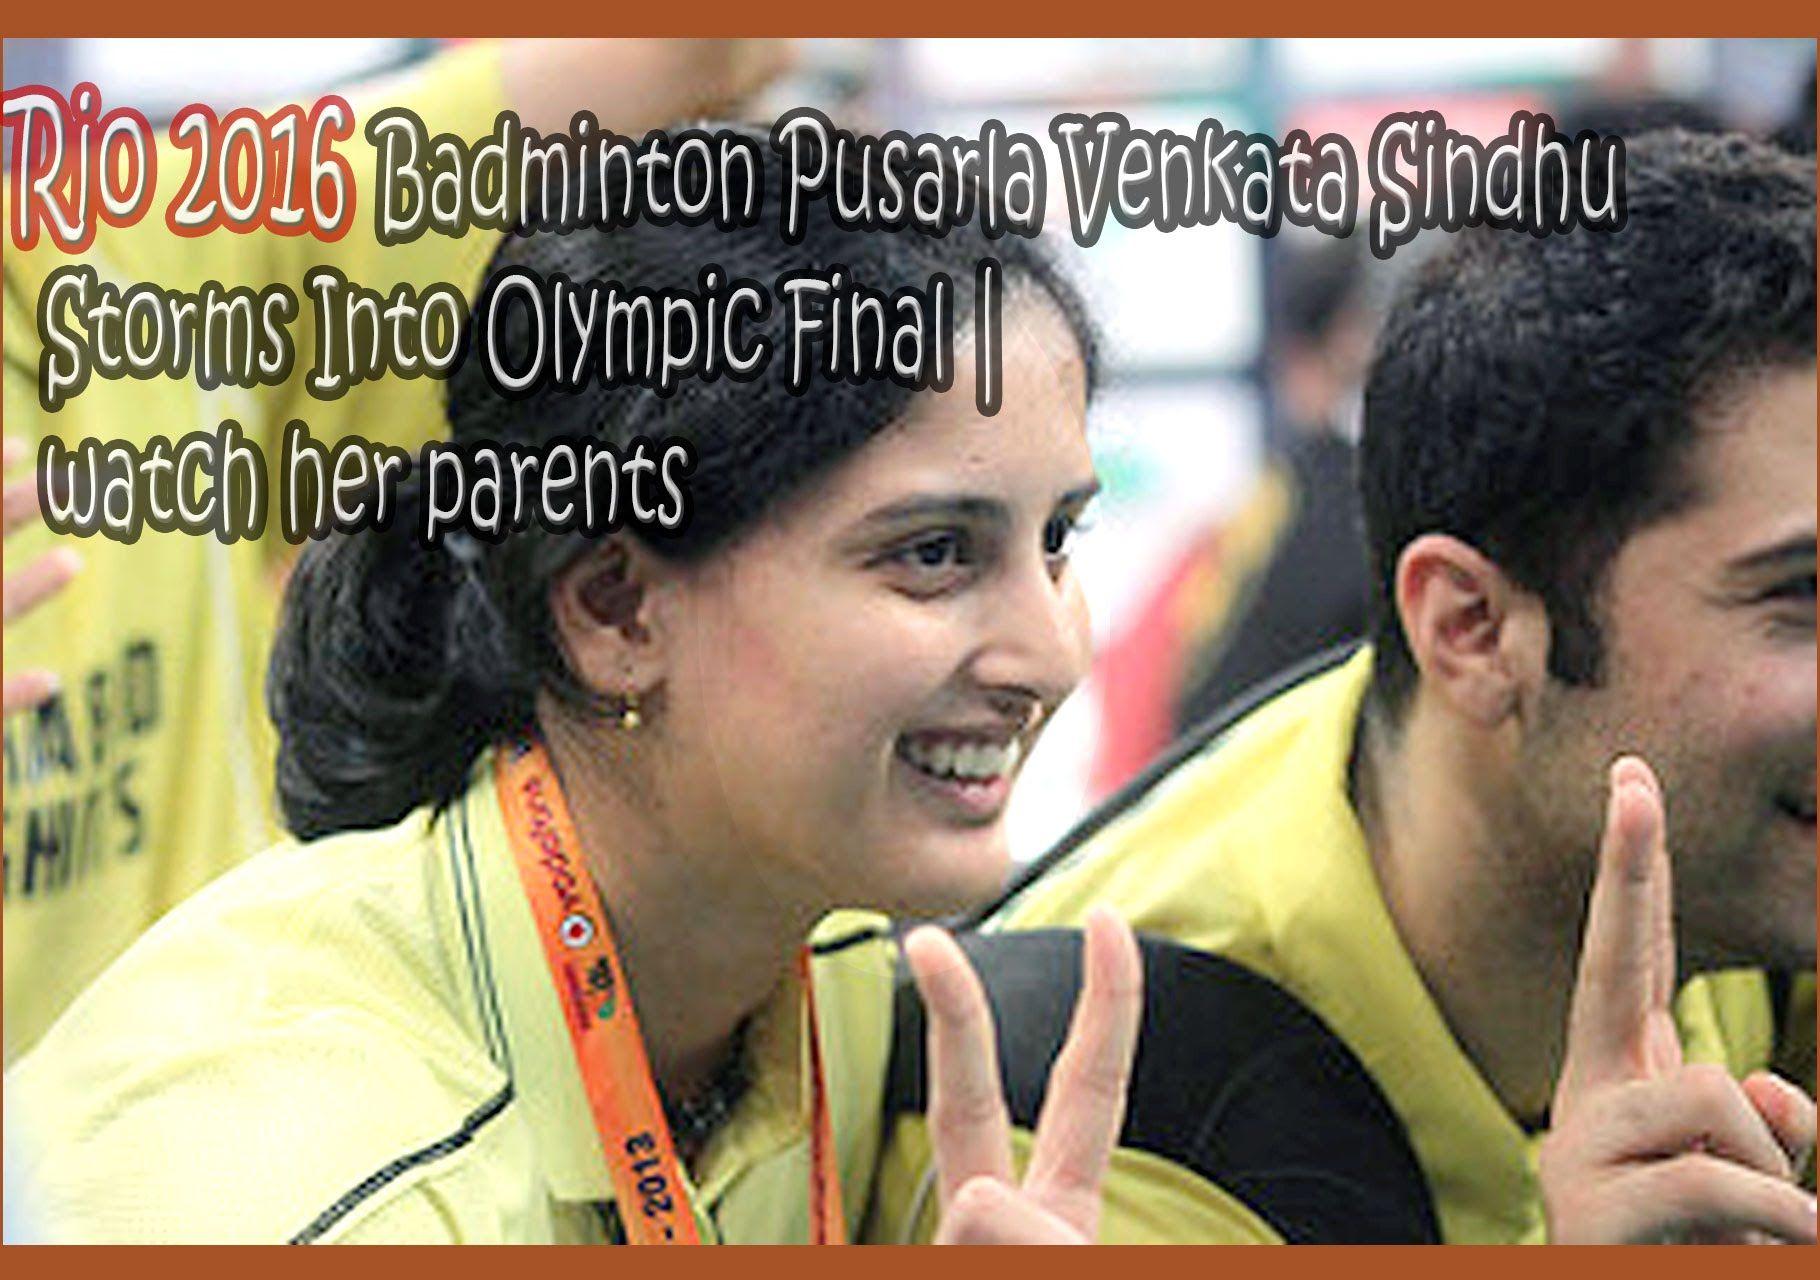 Pusarla Venkata Sindhu born 5 July 1995 is an Indian badminton